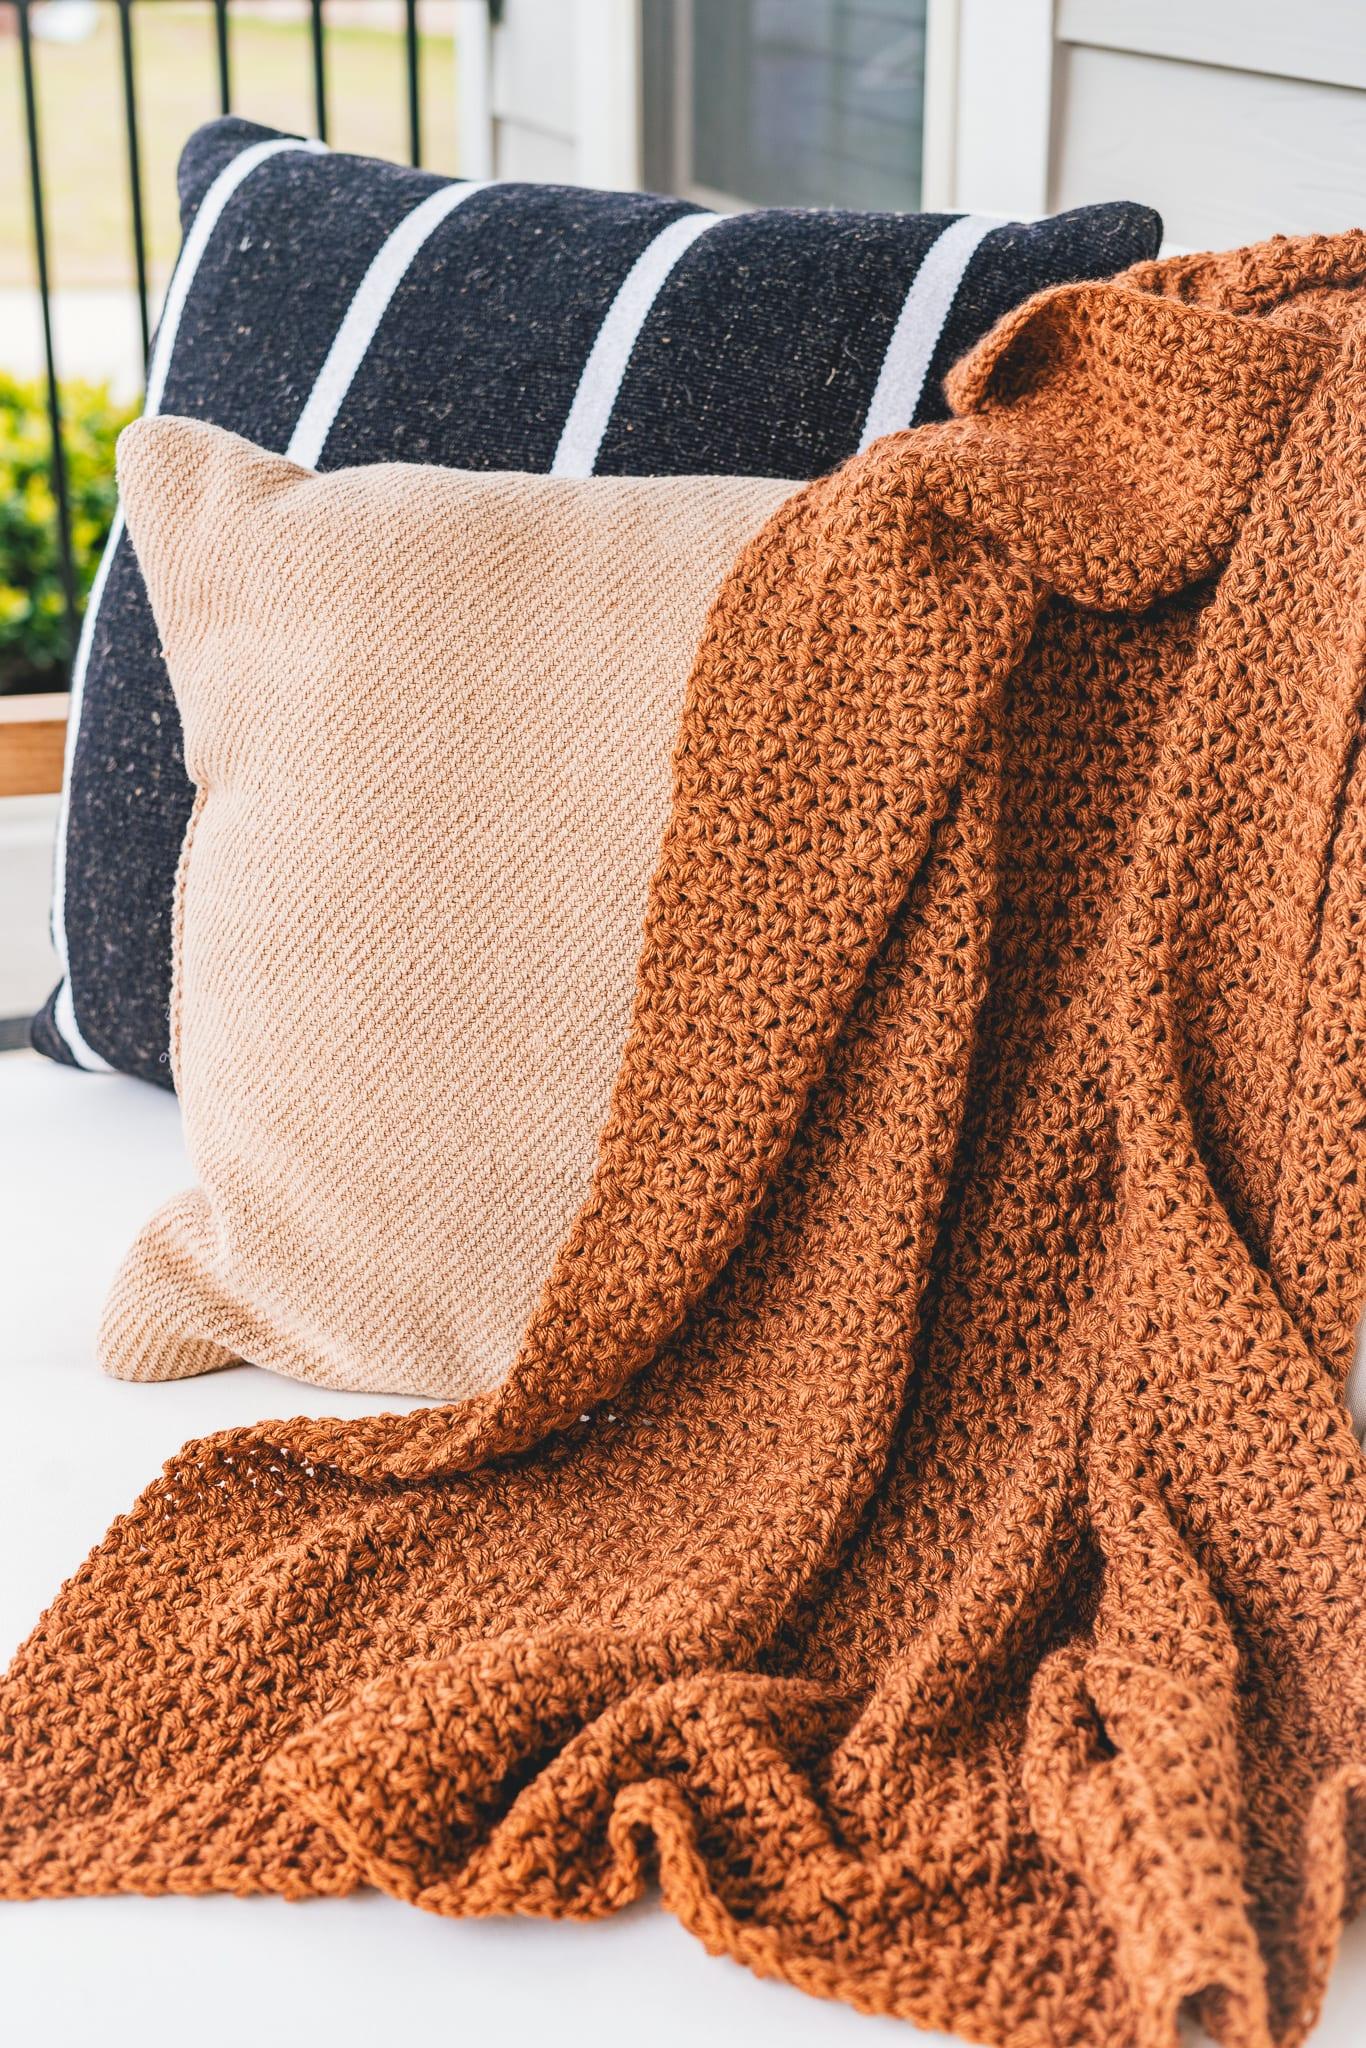 Throw Blanket Bed Cover Cozy Blanket Wool Throw Crochet Blanket Chunky Wool Blanket Chunky Blanket